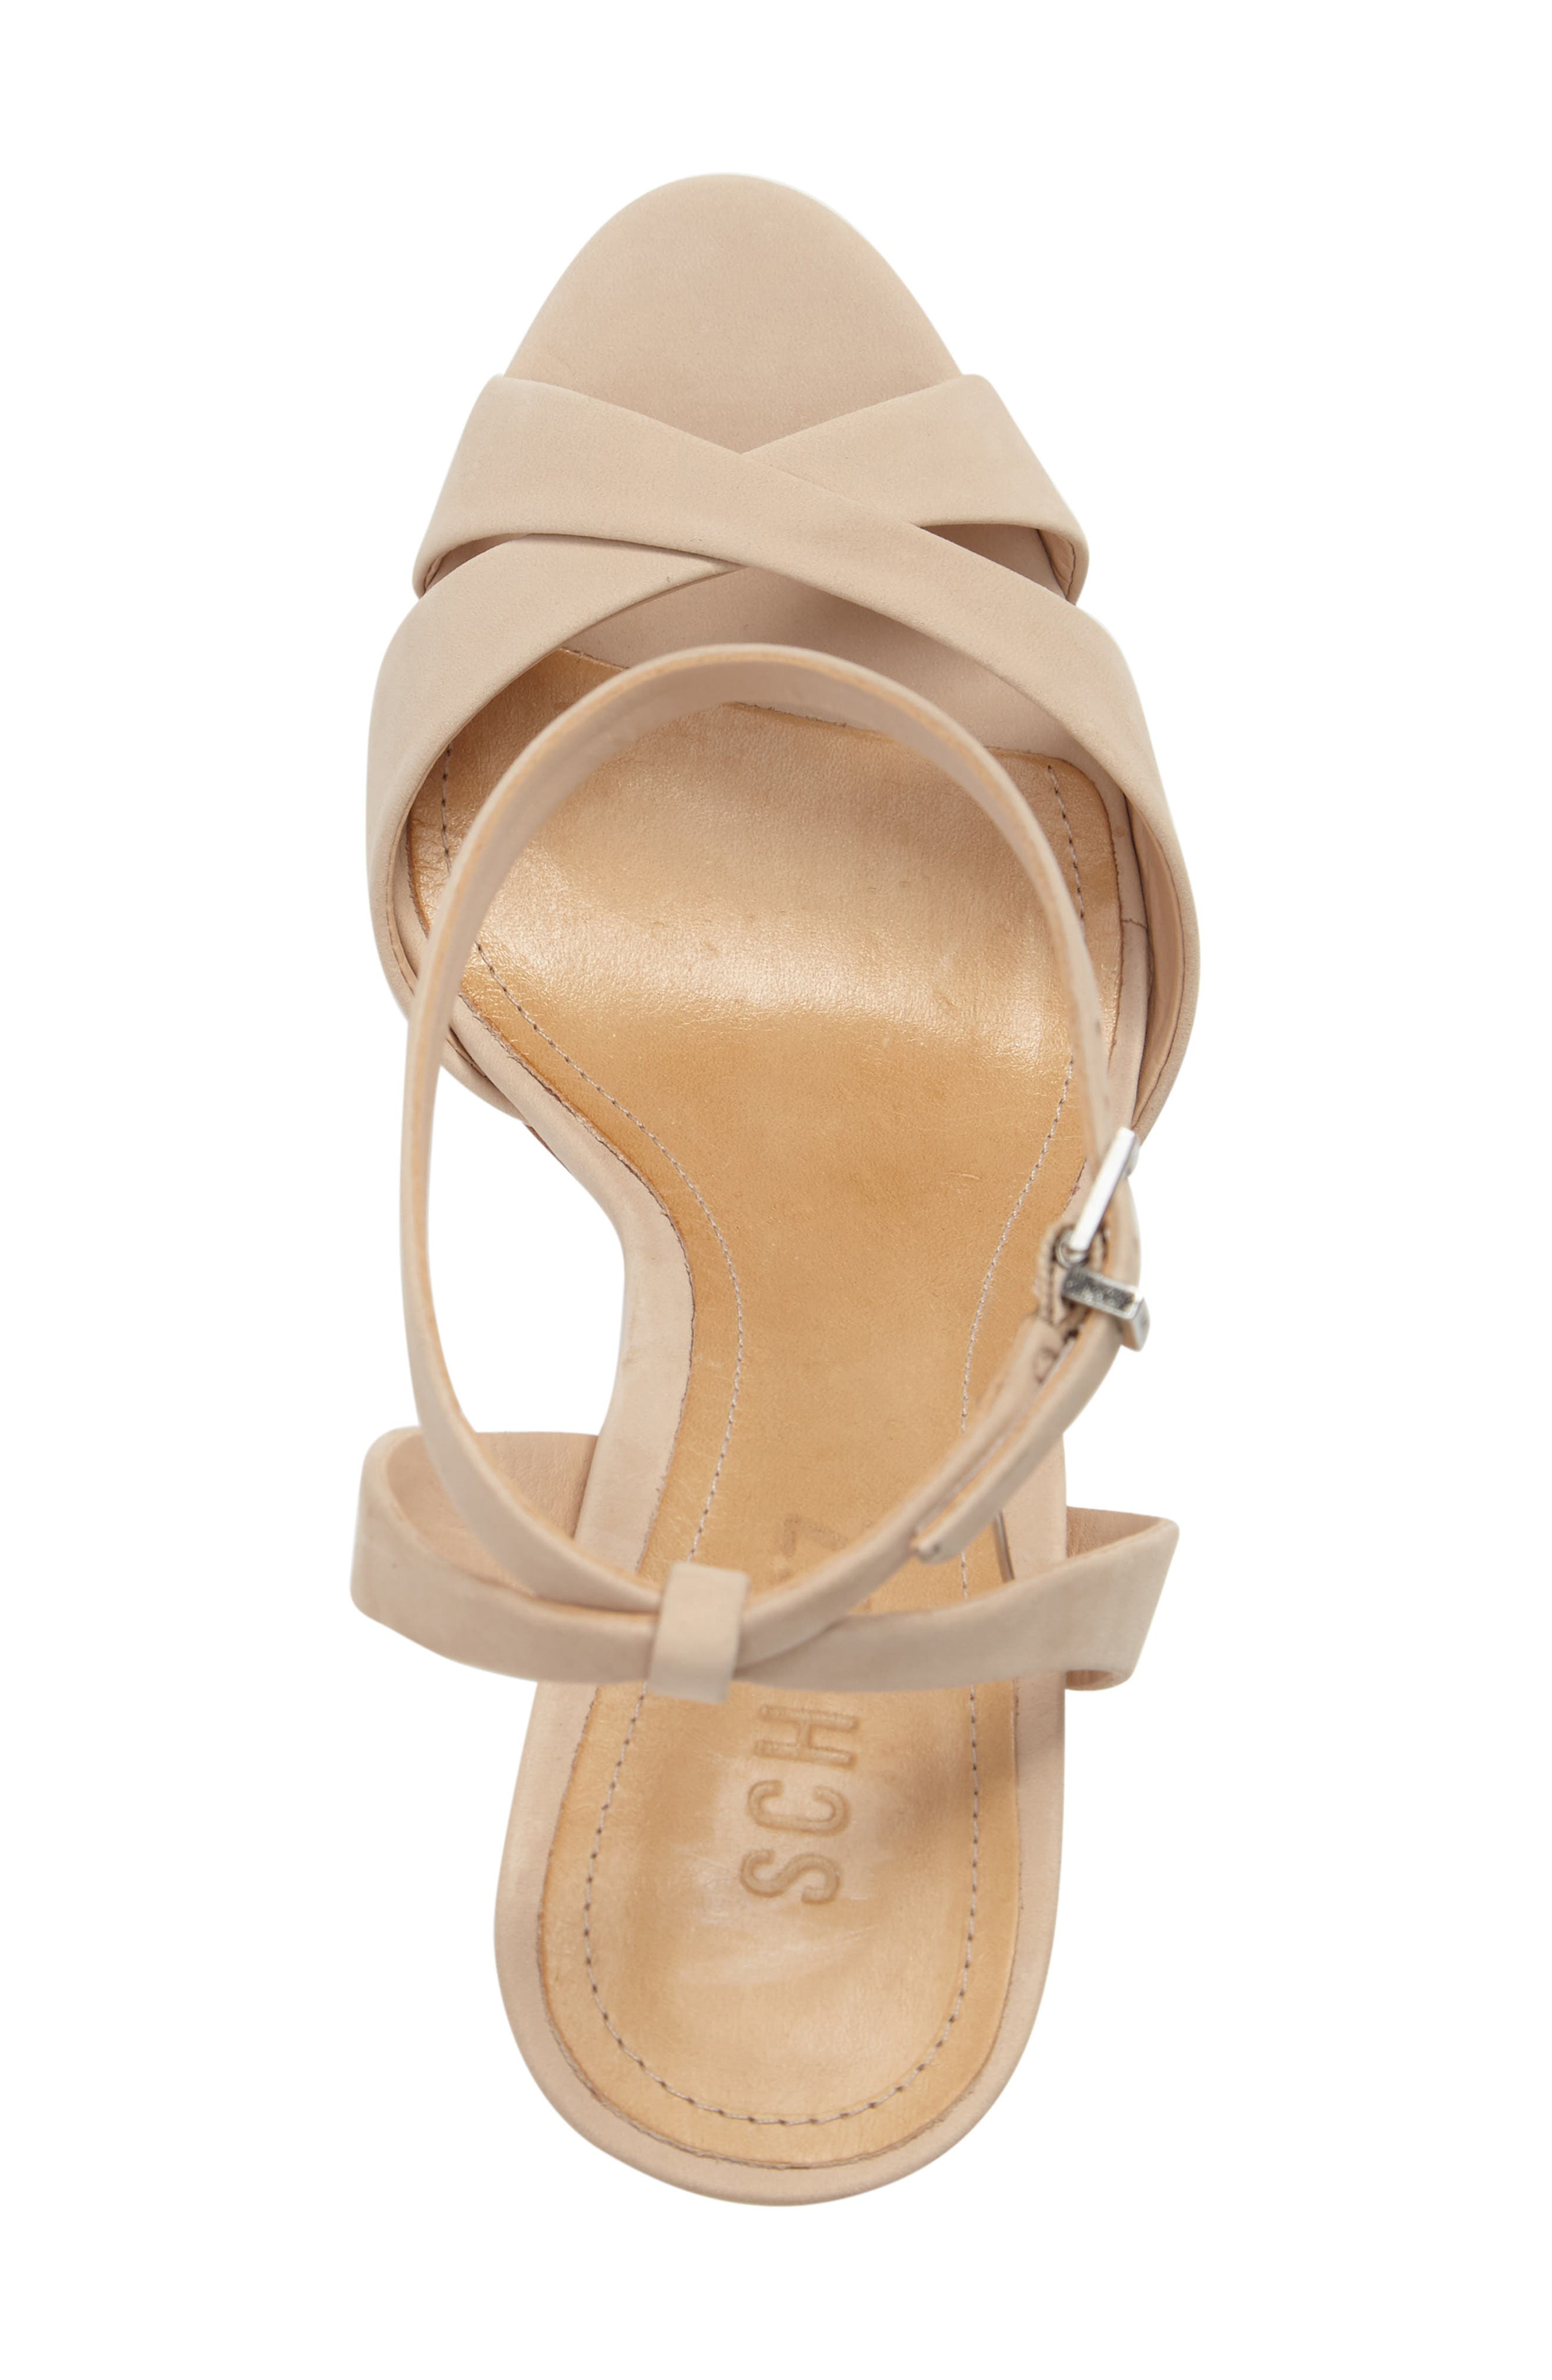 Olyvia Cross Toe Sandal,                             Alternate thumbnail 10, color,